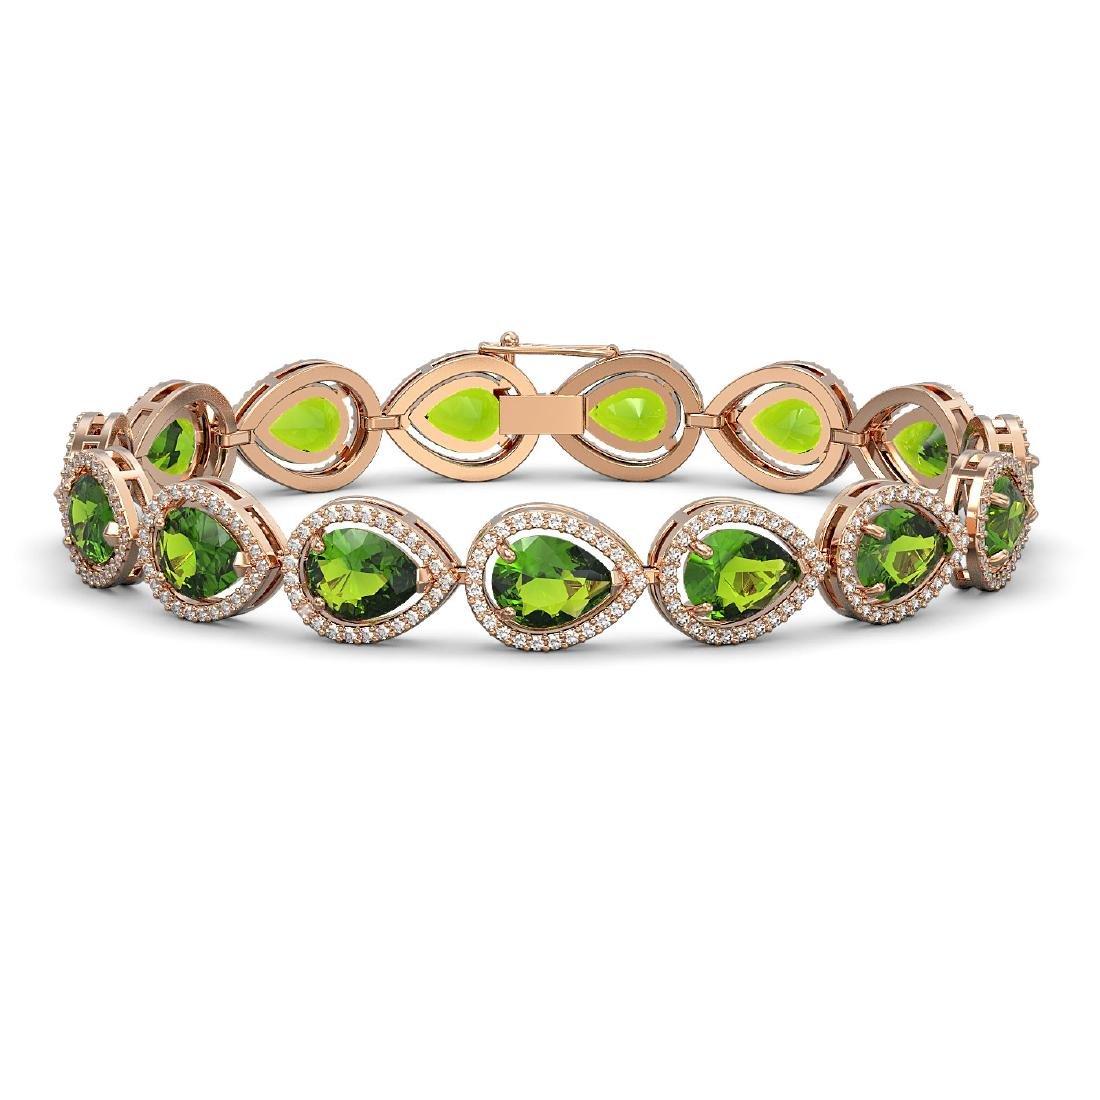 15.8 CTW Peridot & Diamond Halo Bracelet 10K Rose Gold